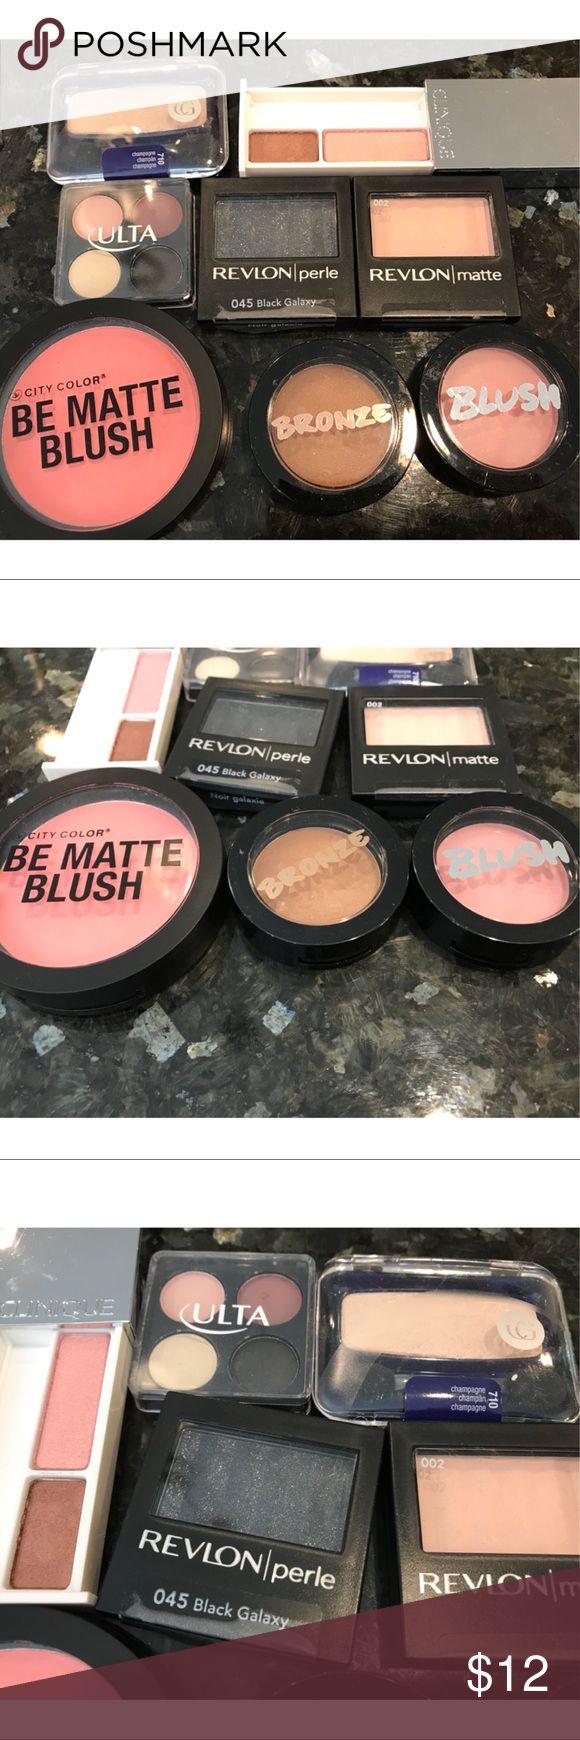 Makeup Model Co., Ulta, Revlon/Clinique/Cover Girl Cover